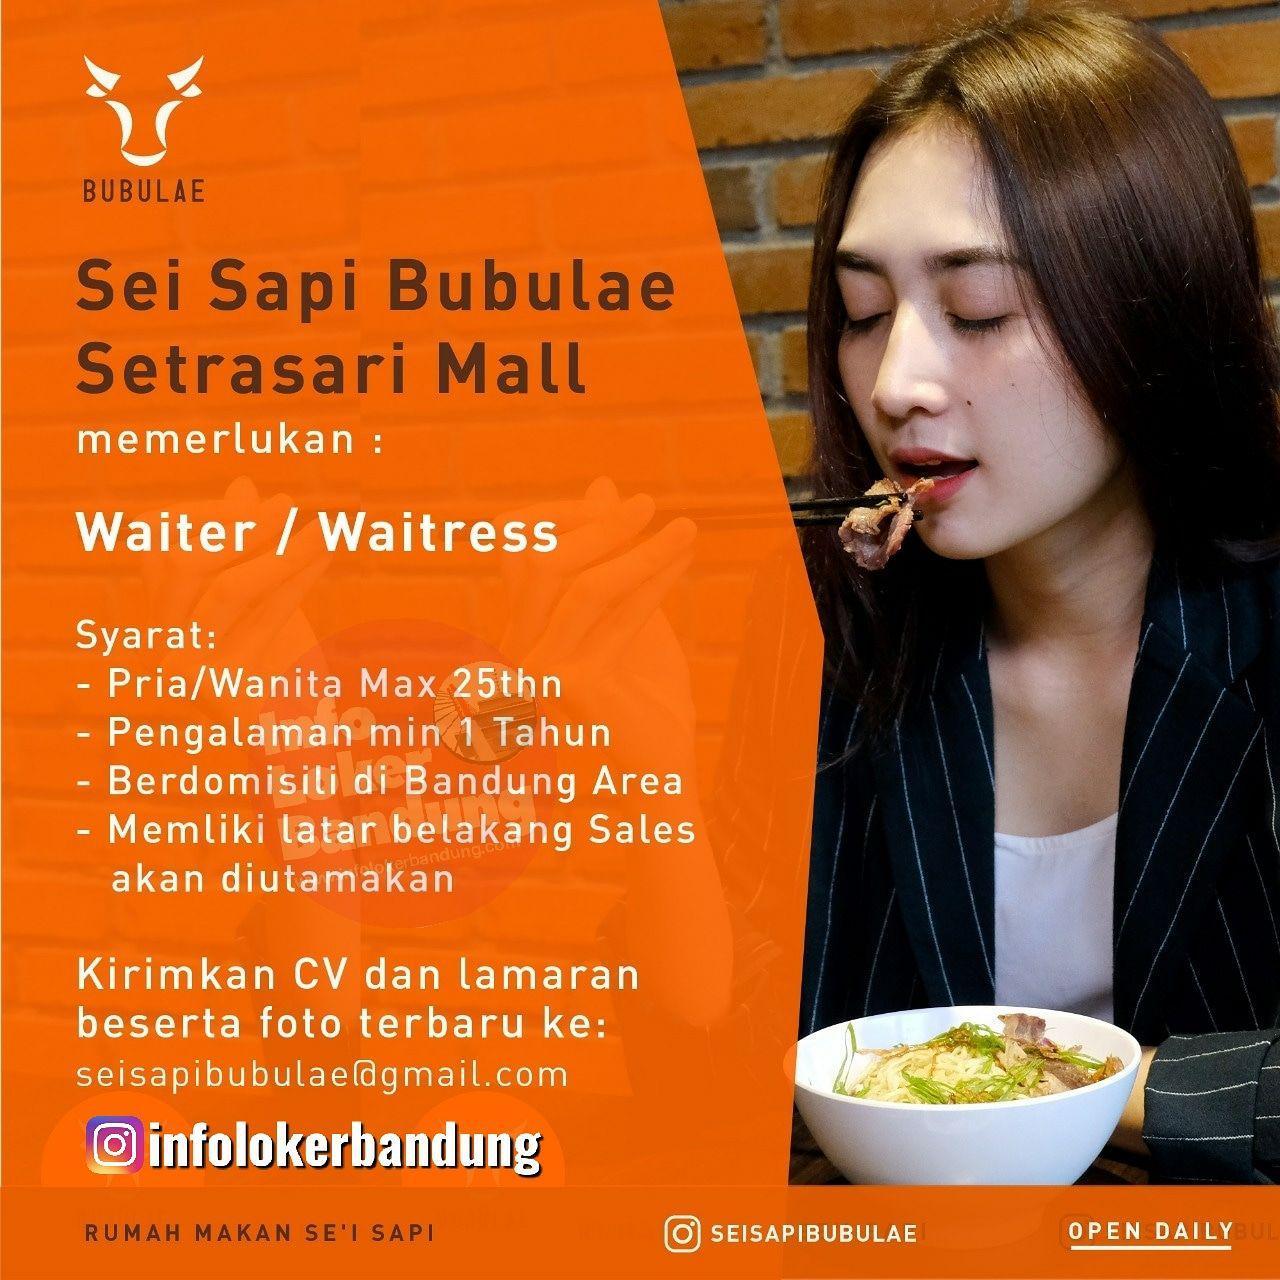 Lowongan Kerja Sei Sapi Bubulae Setrasari Mall Bandung Juli 2019